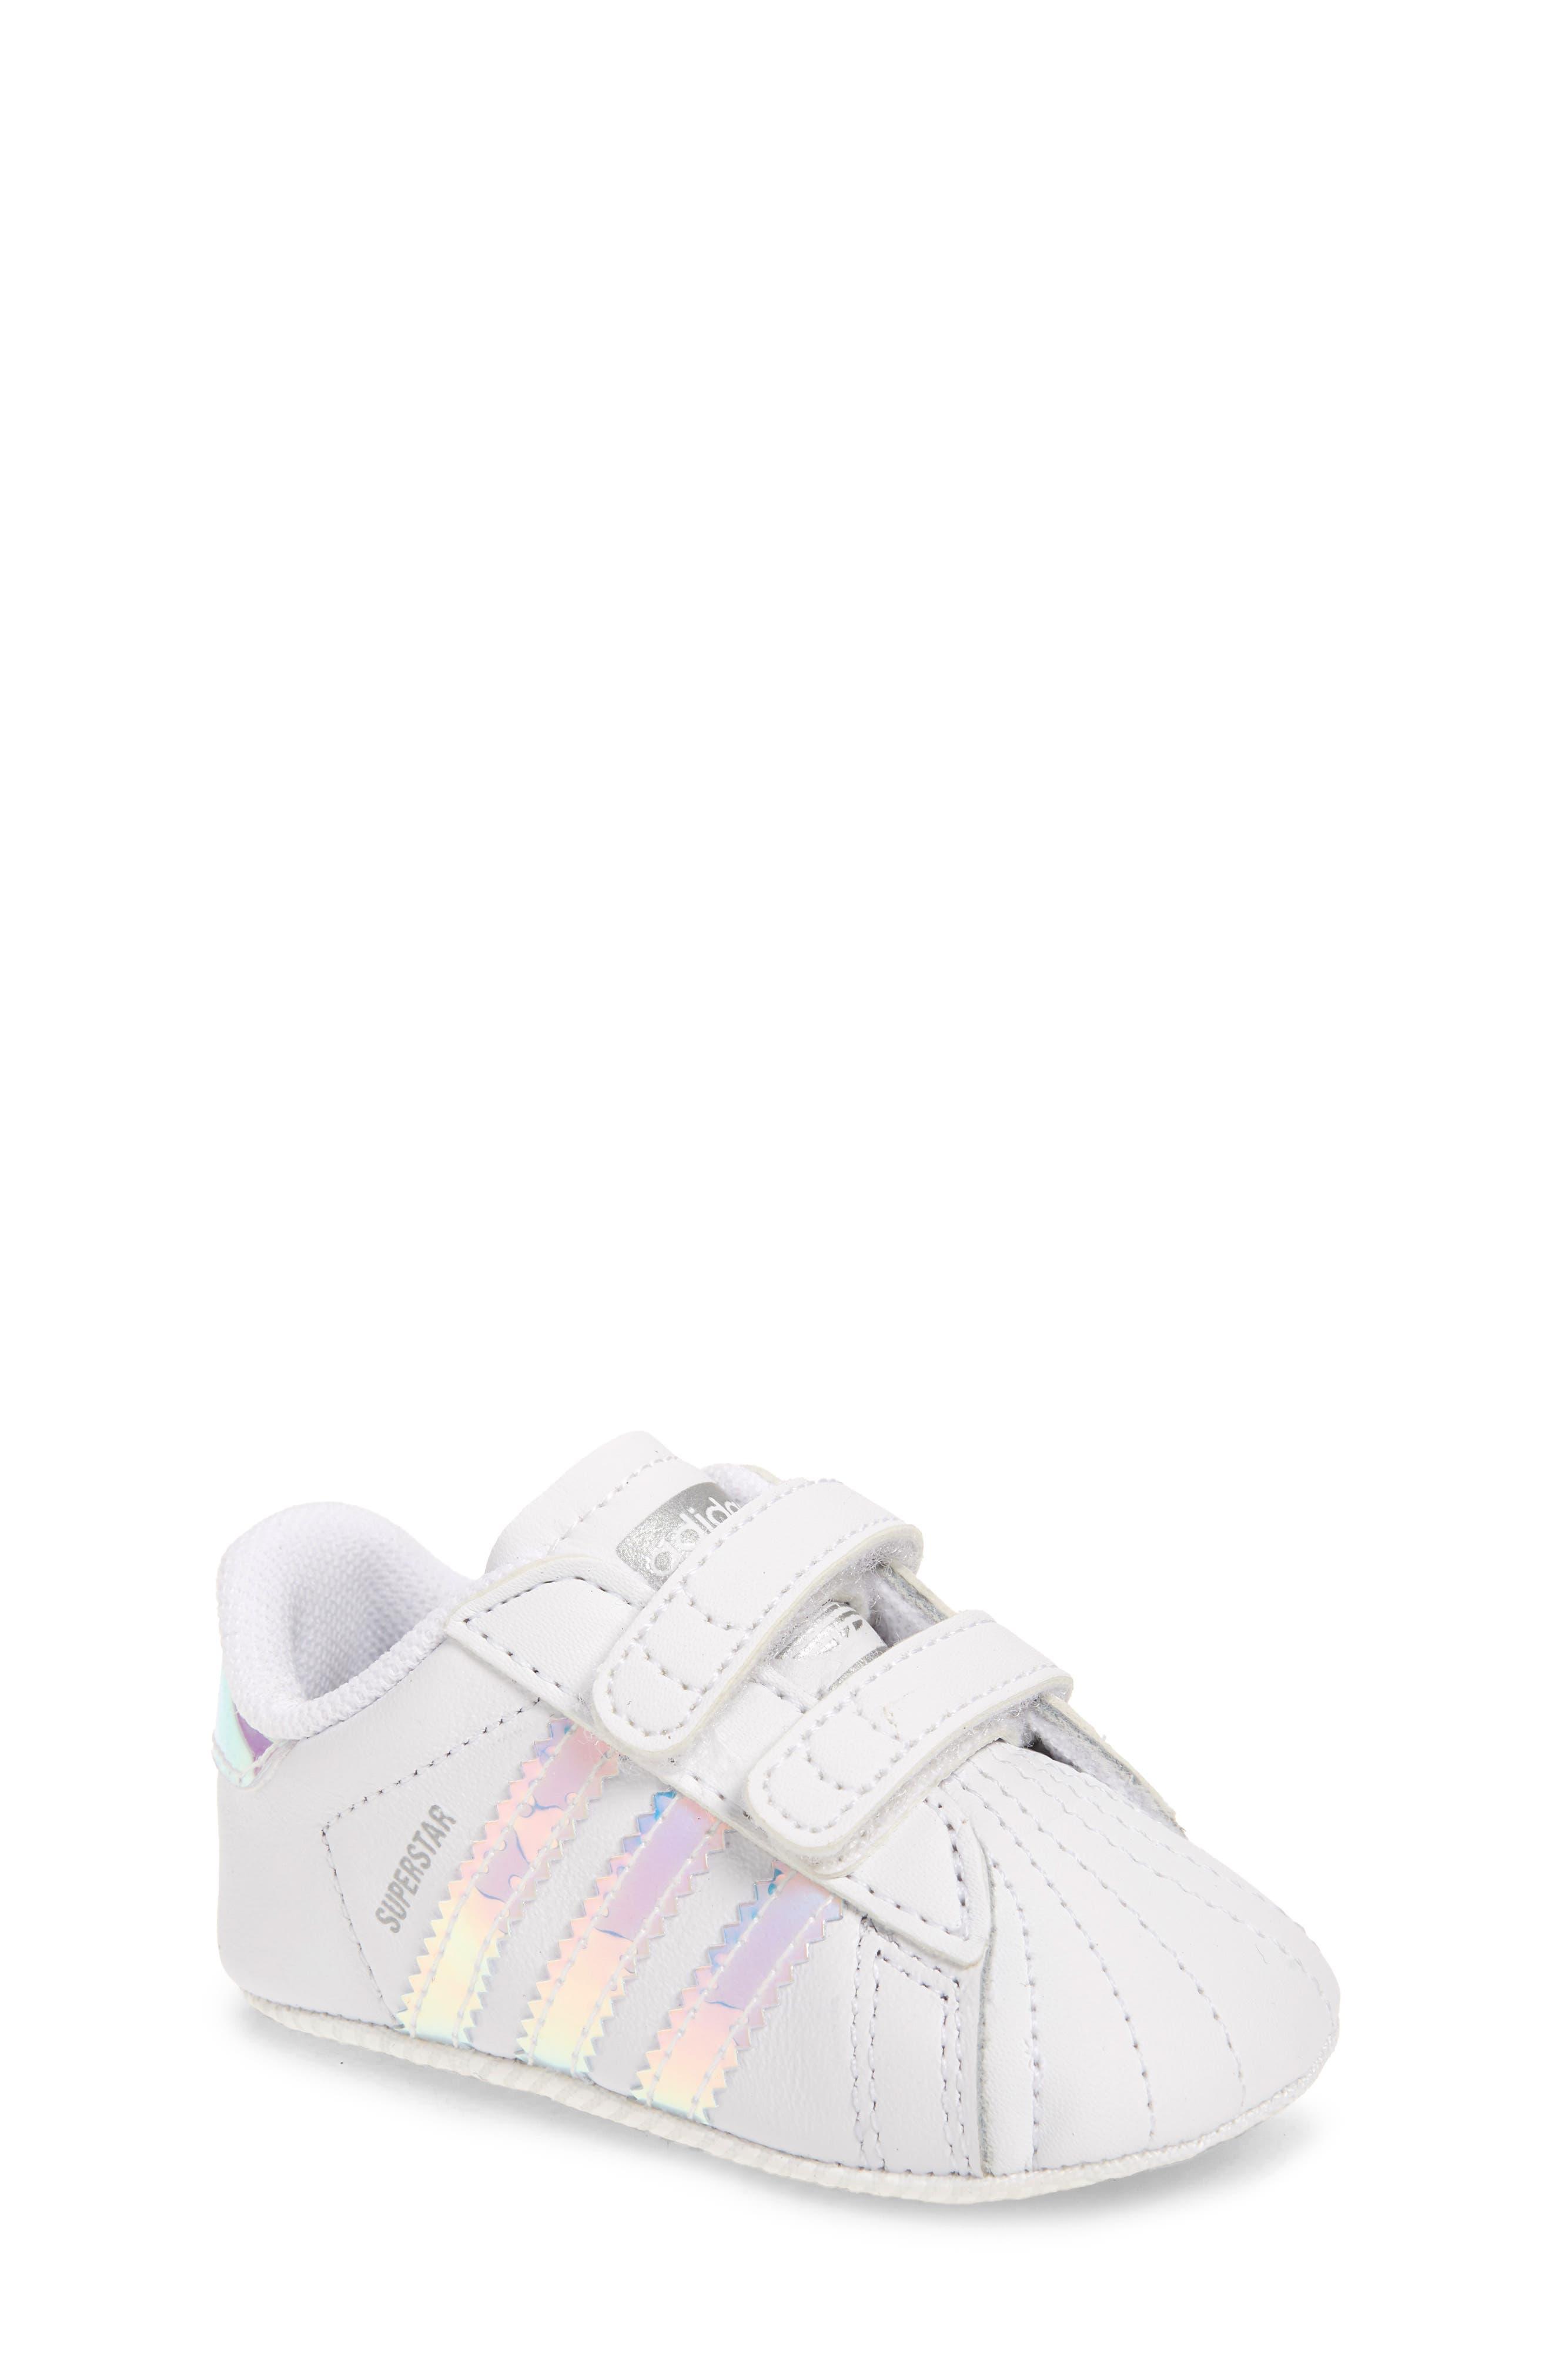 Baby adidas, Walker & Toddler Shoes | Nordstrom